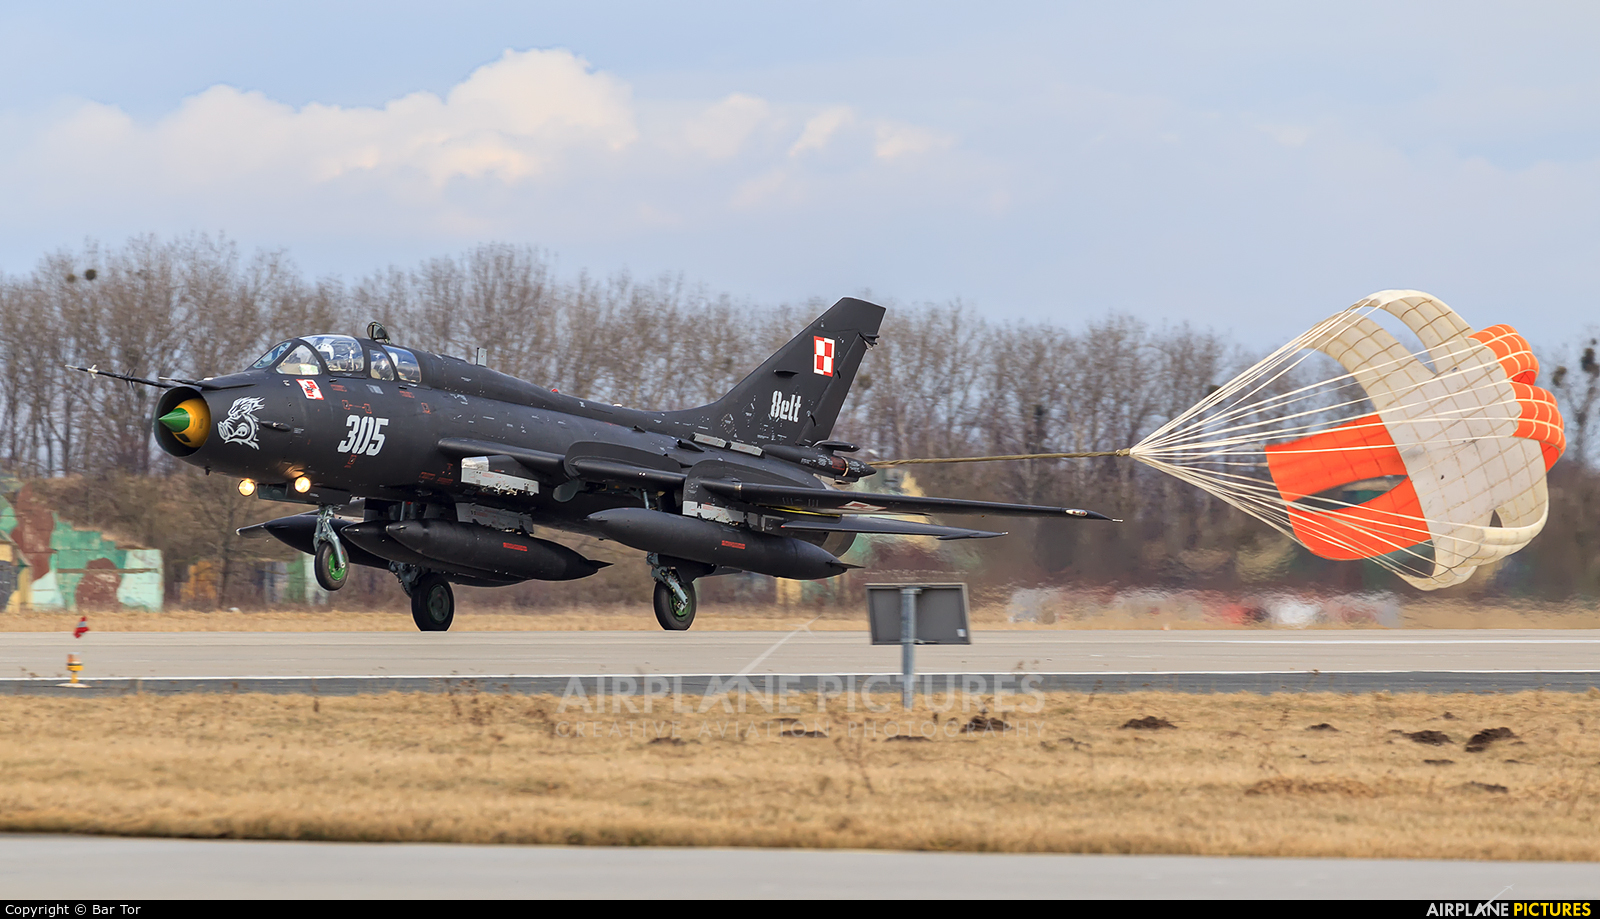 Poland - Air Force 305 aircraft at Poznań - Krzesiny